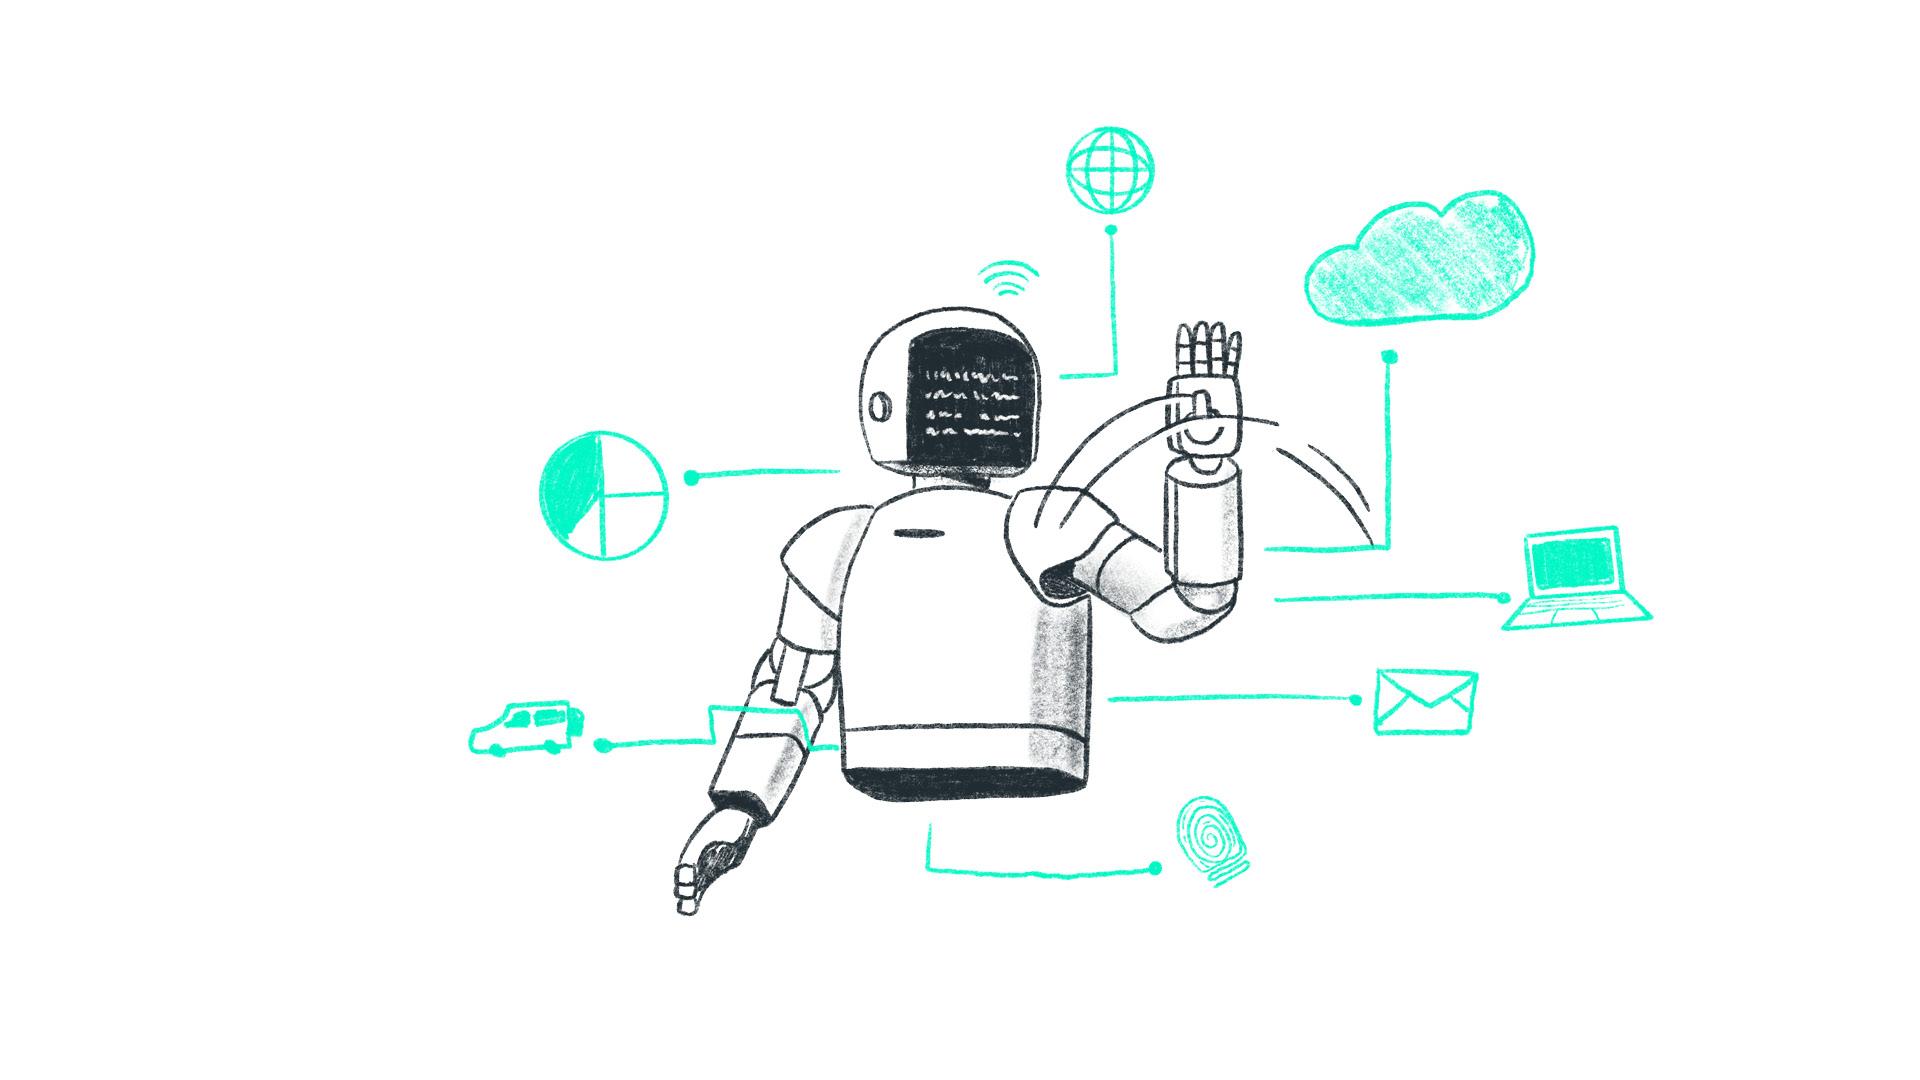 Met digitalisering groeit elk bedrijf